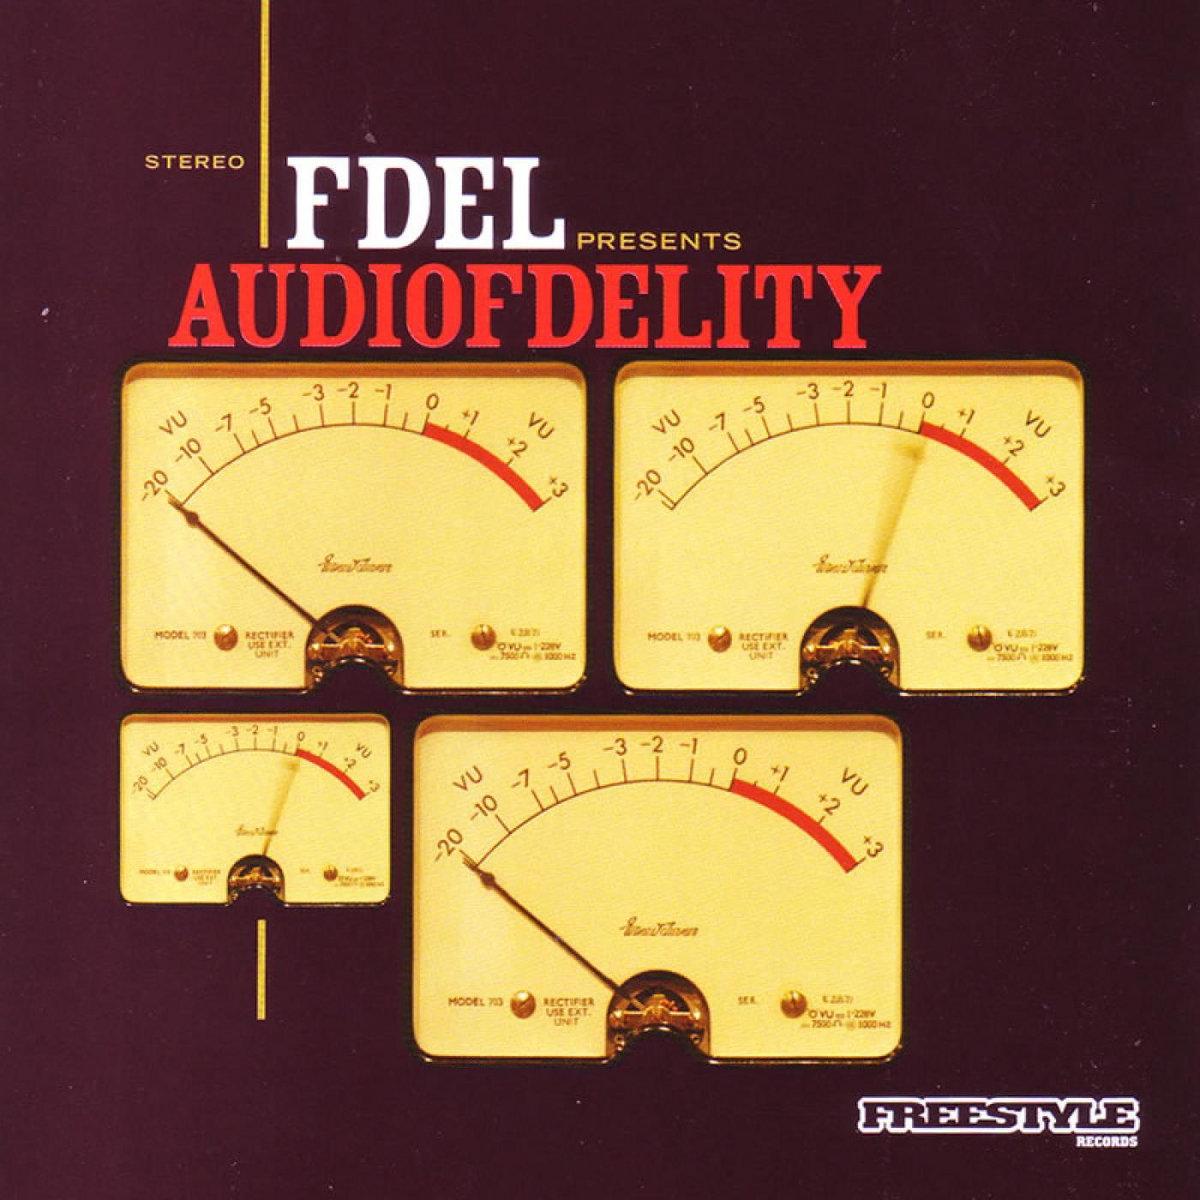 fdel audiofdelity